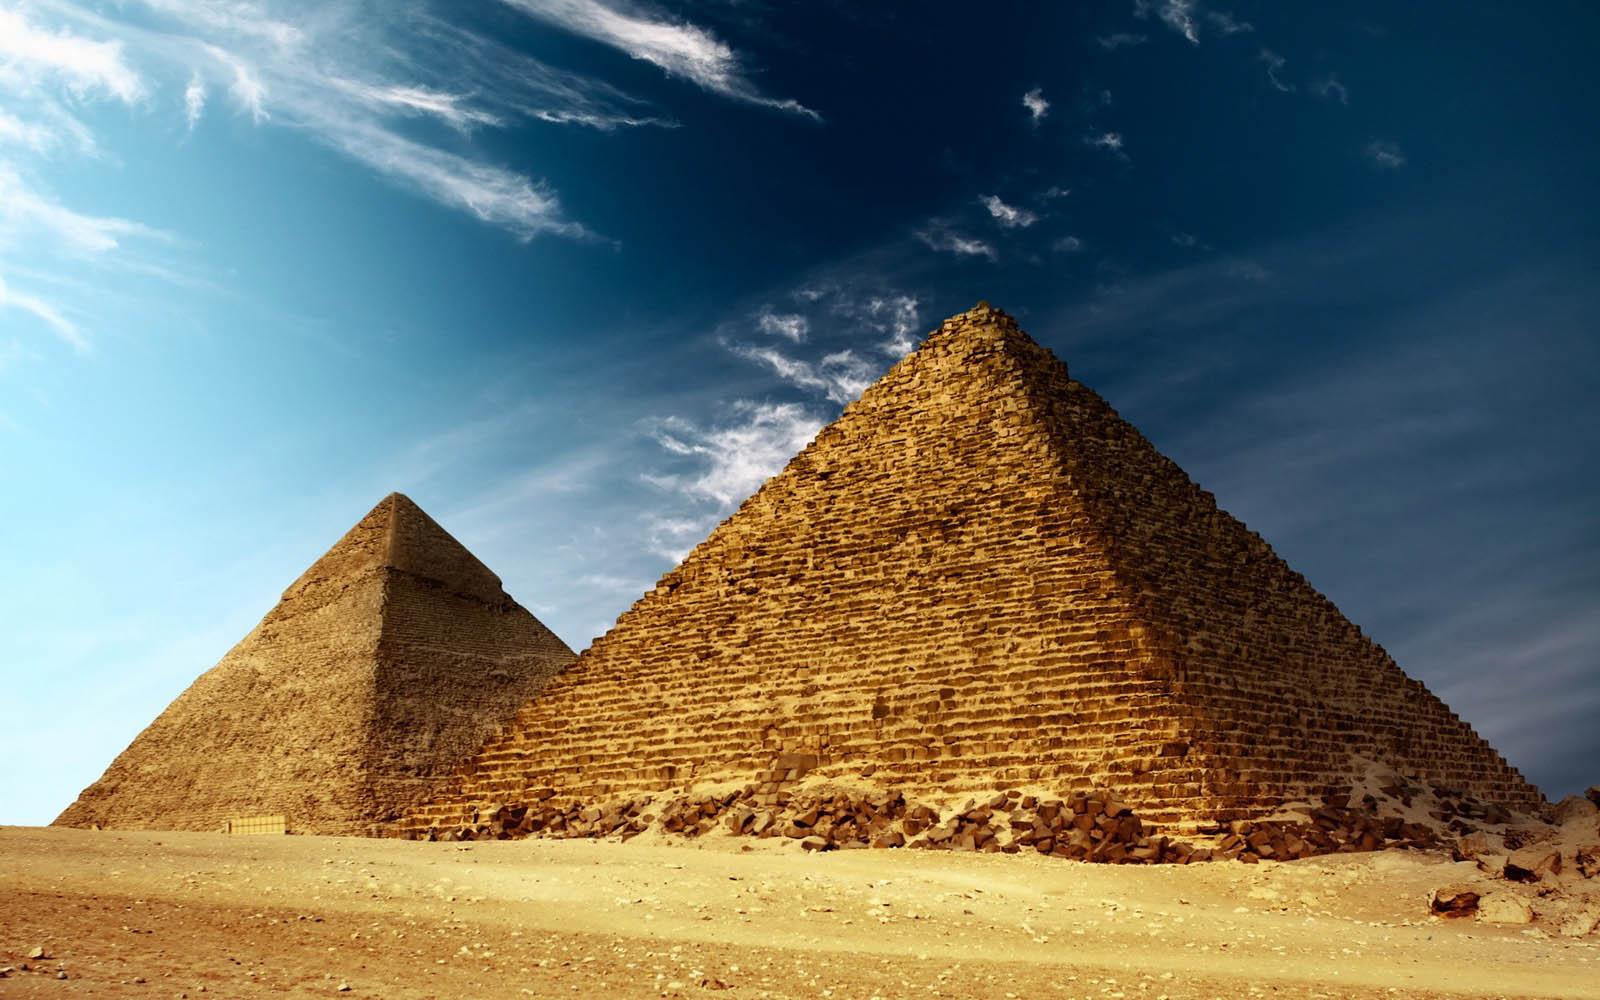 egypt pyramids wallpapers egypt pyramids desktop wallpapers egypt ...